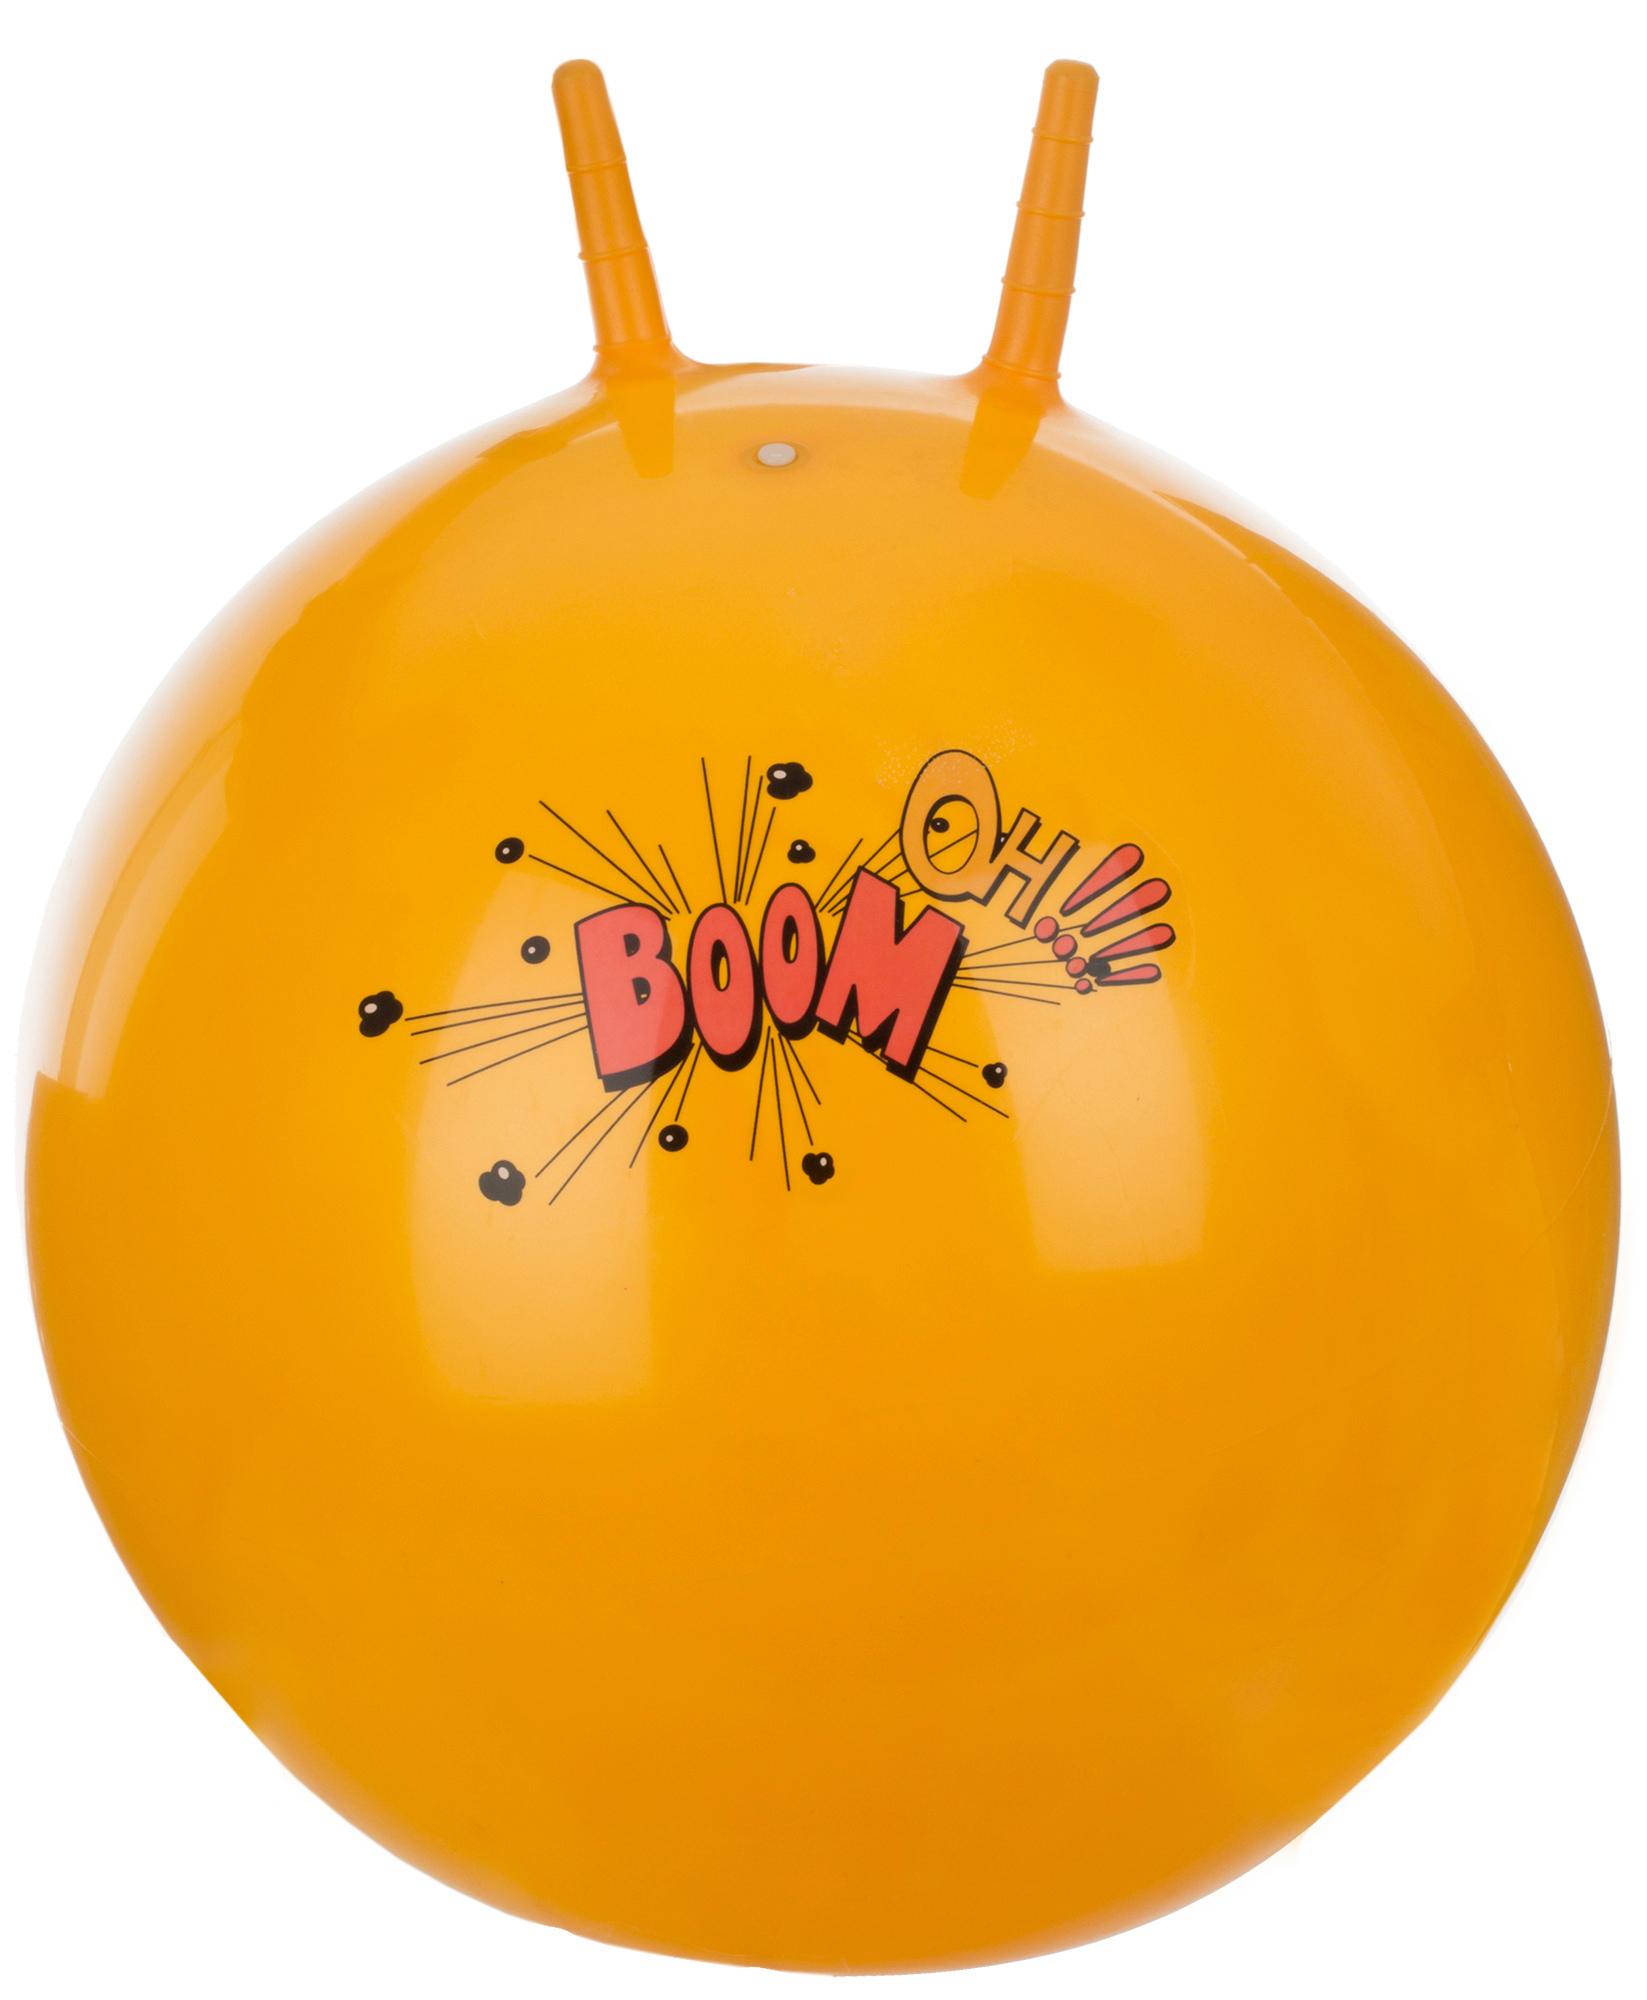 цена на Torneo Мяч гимнастический детский Torneo